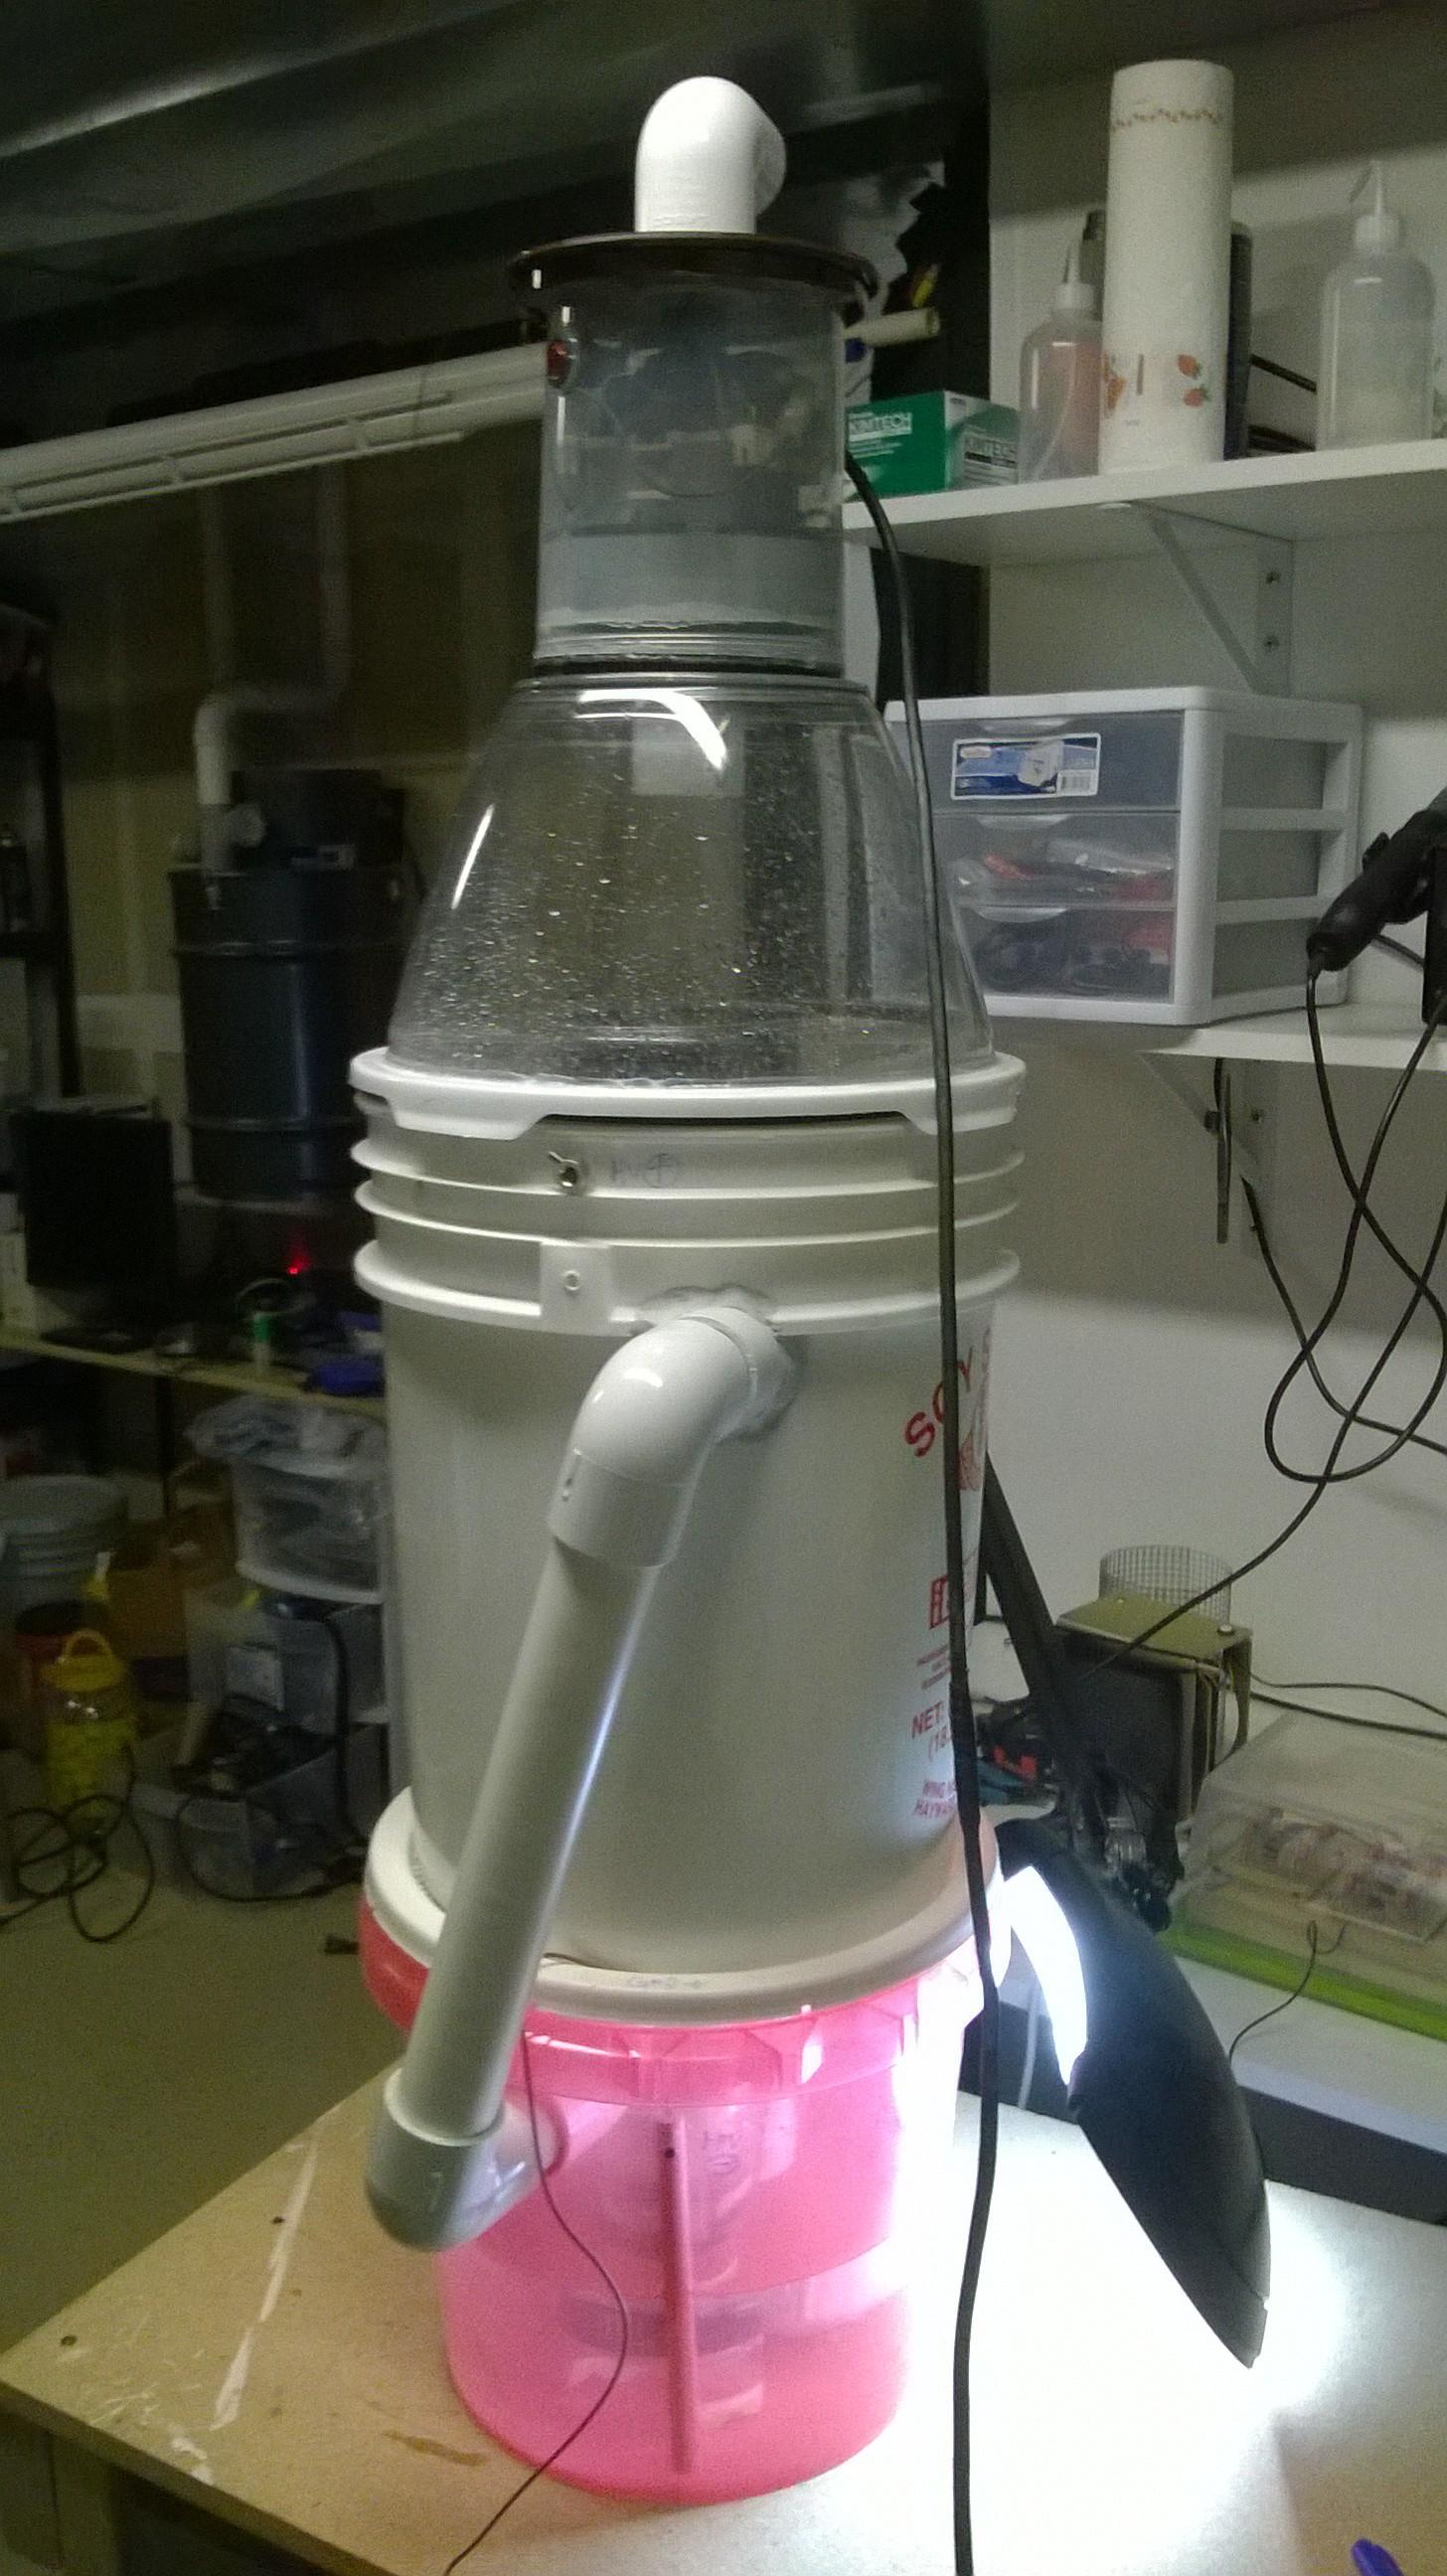 Household Electrically Enhanced Wet Scrubber   Hackaday io